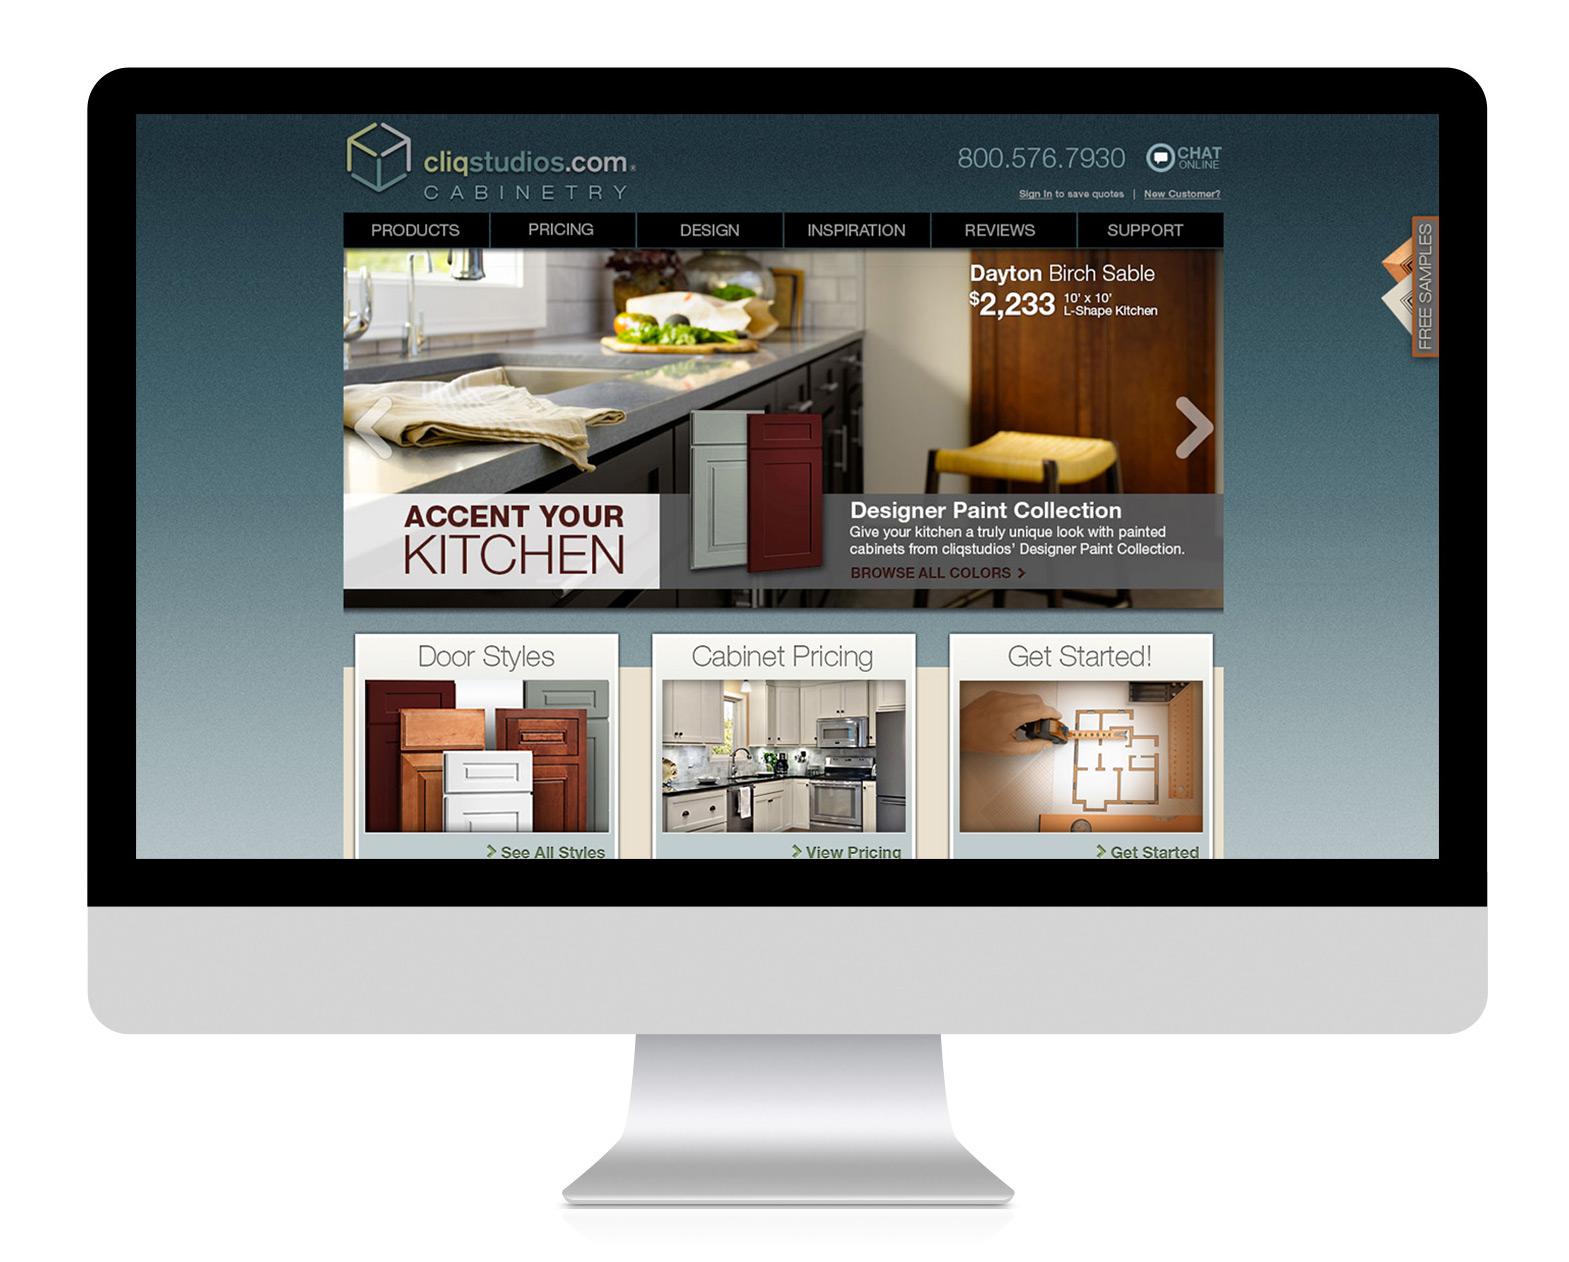 Newer website design